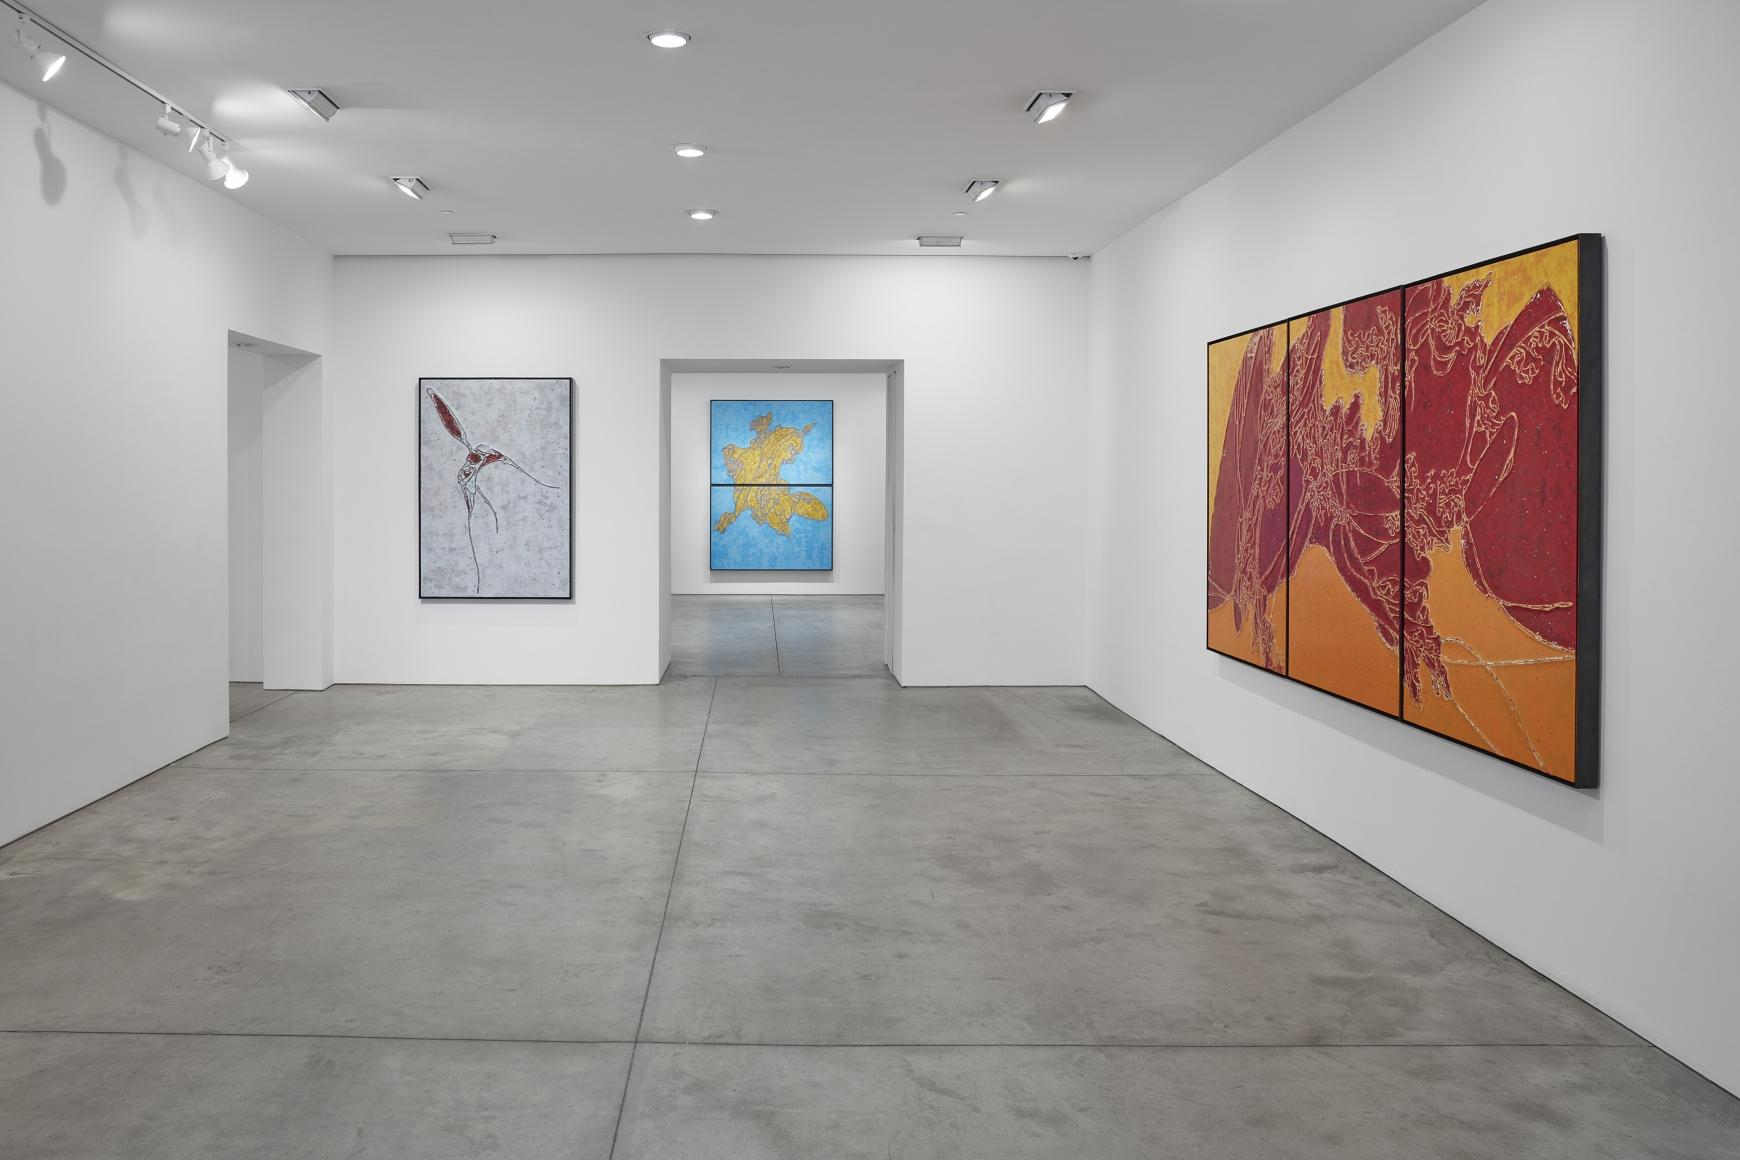 Lee Bul, Interlude: Perdu Installation view 1